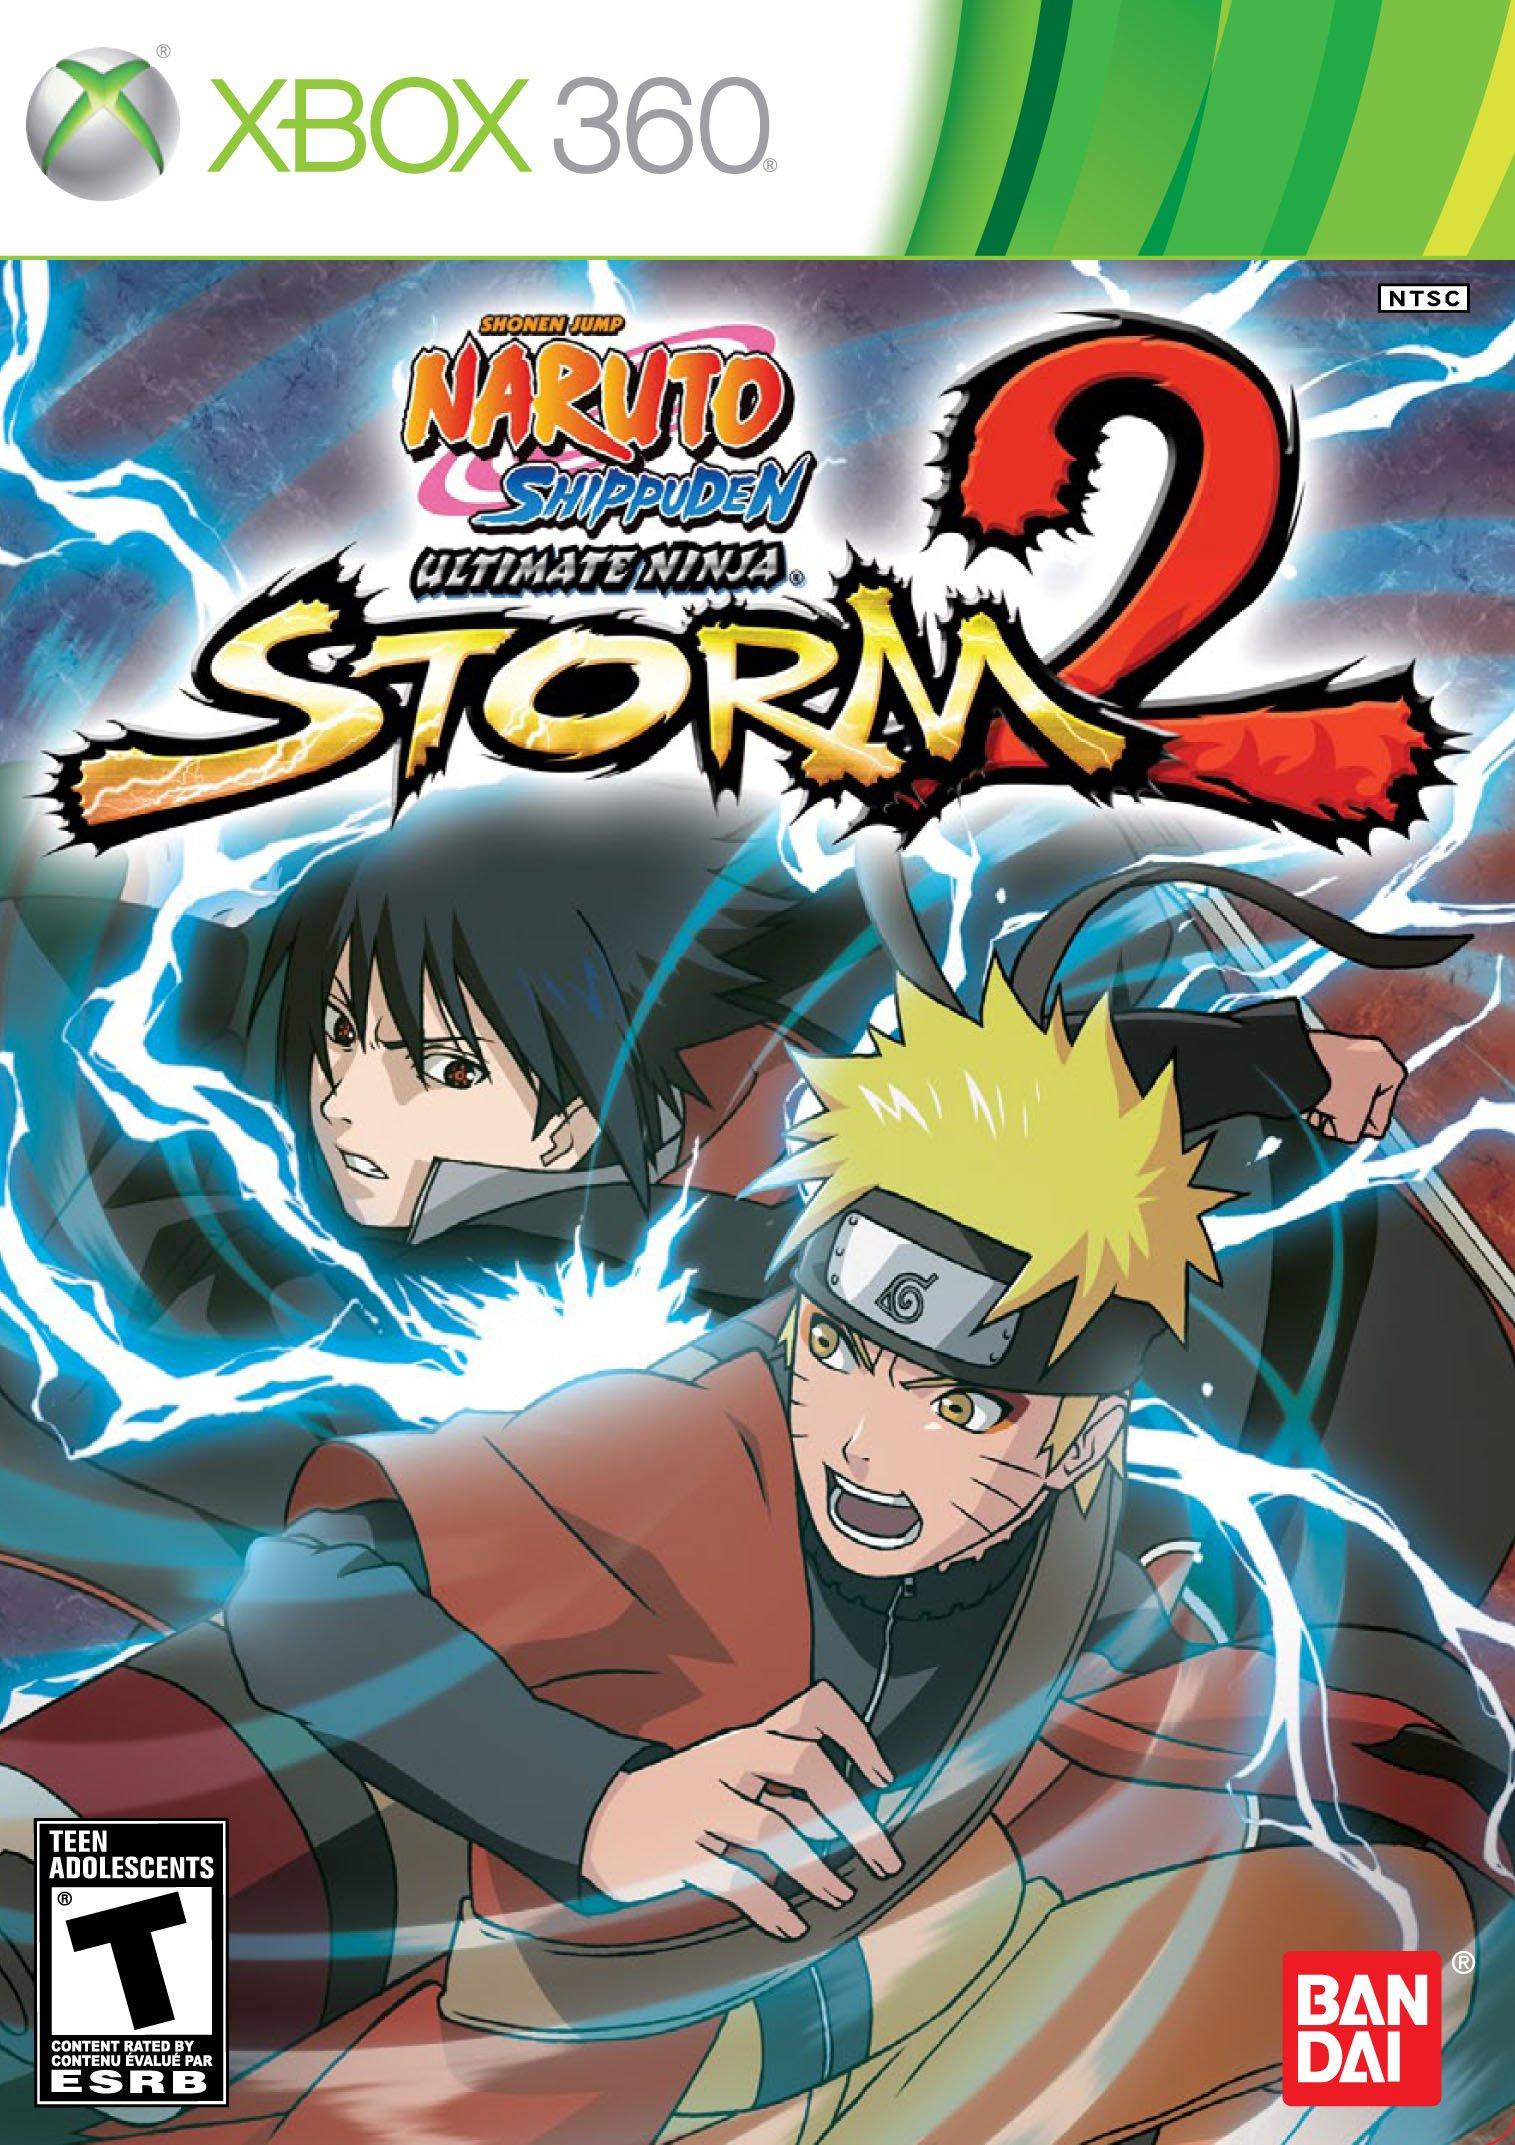 Naruto release date in Perth